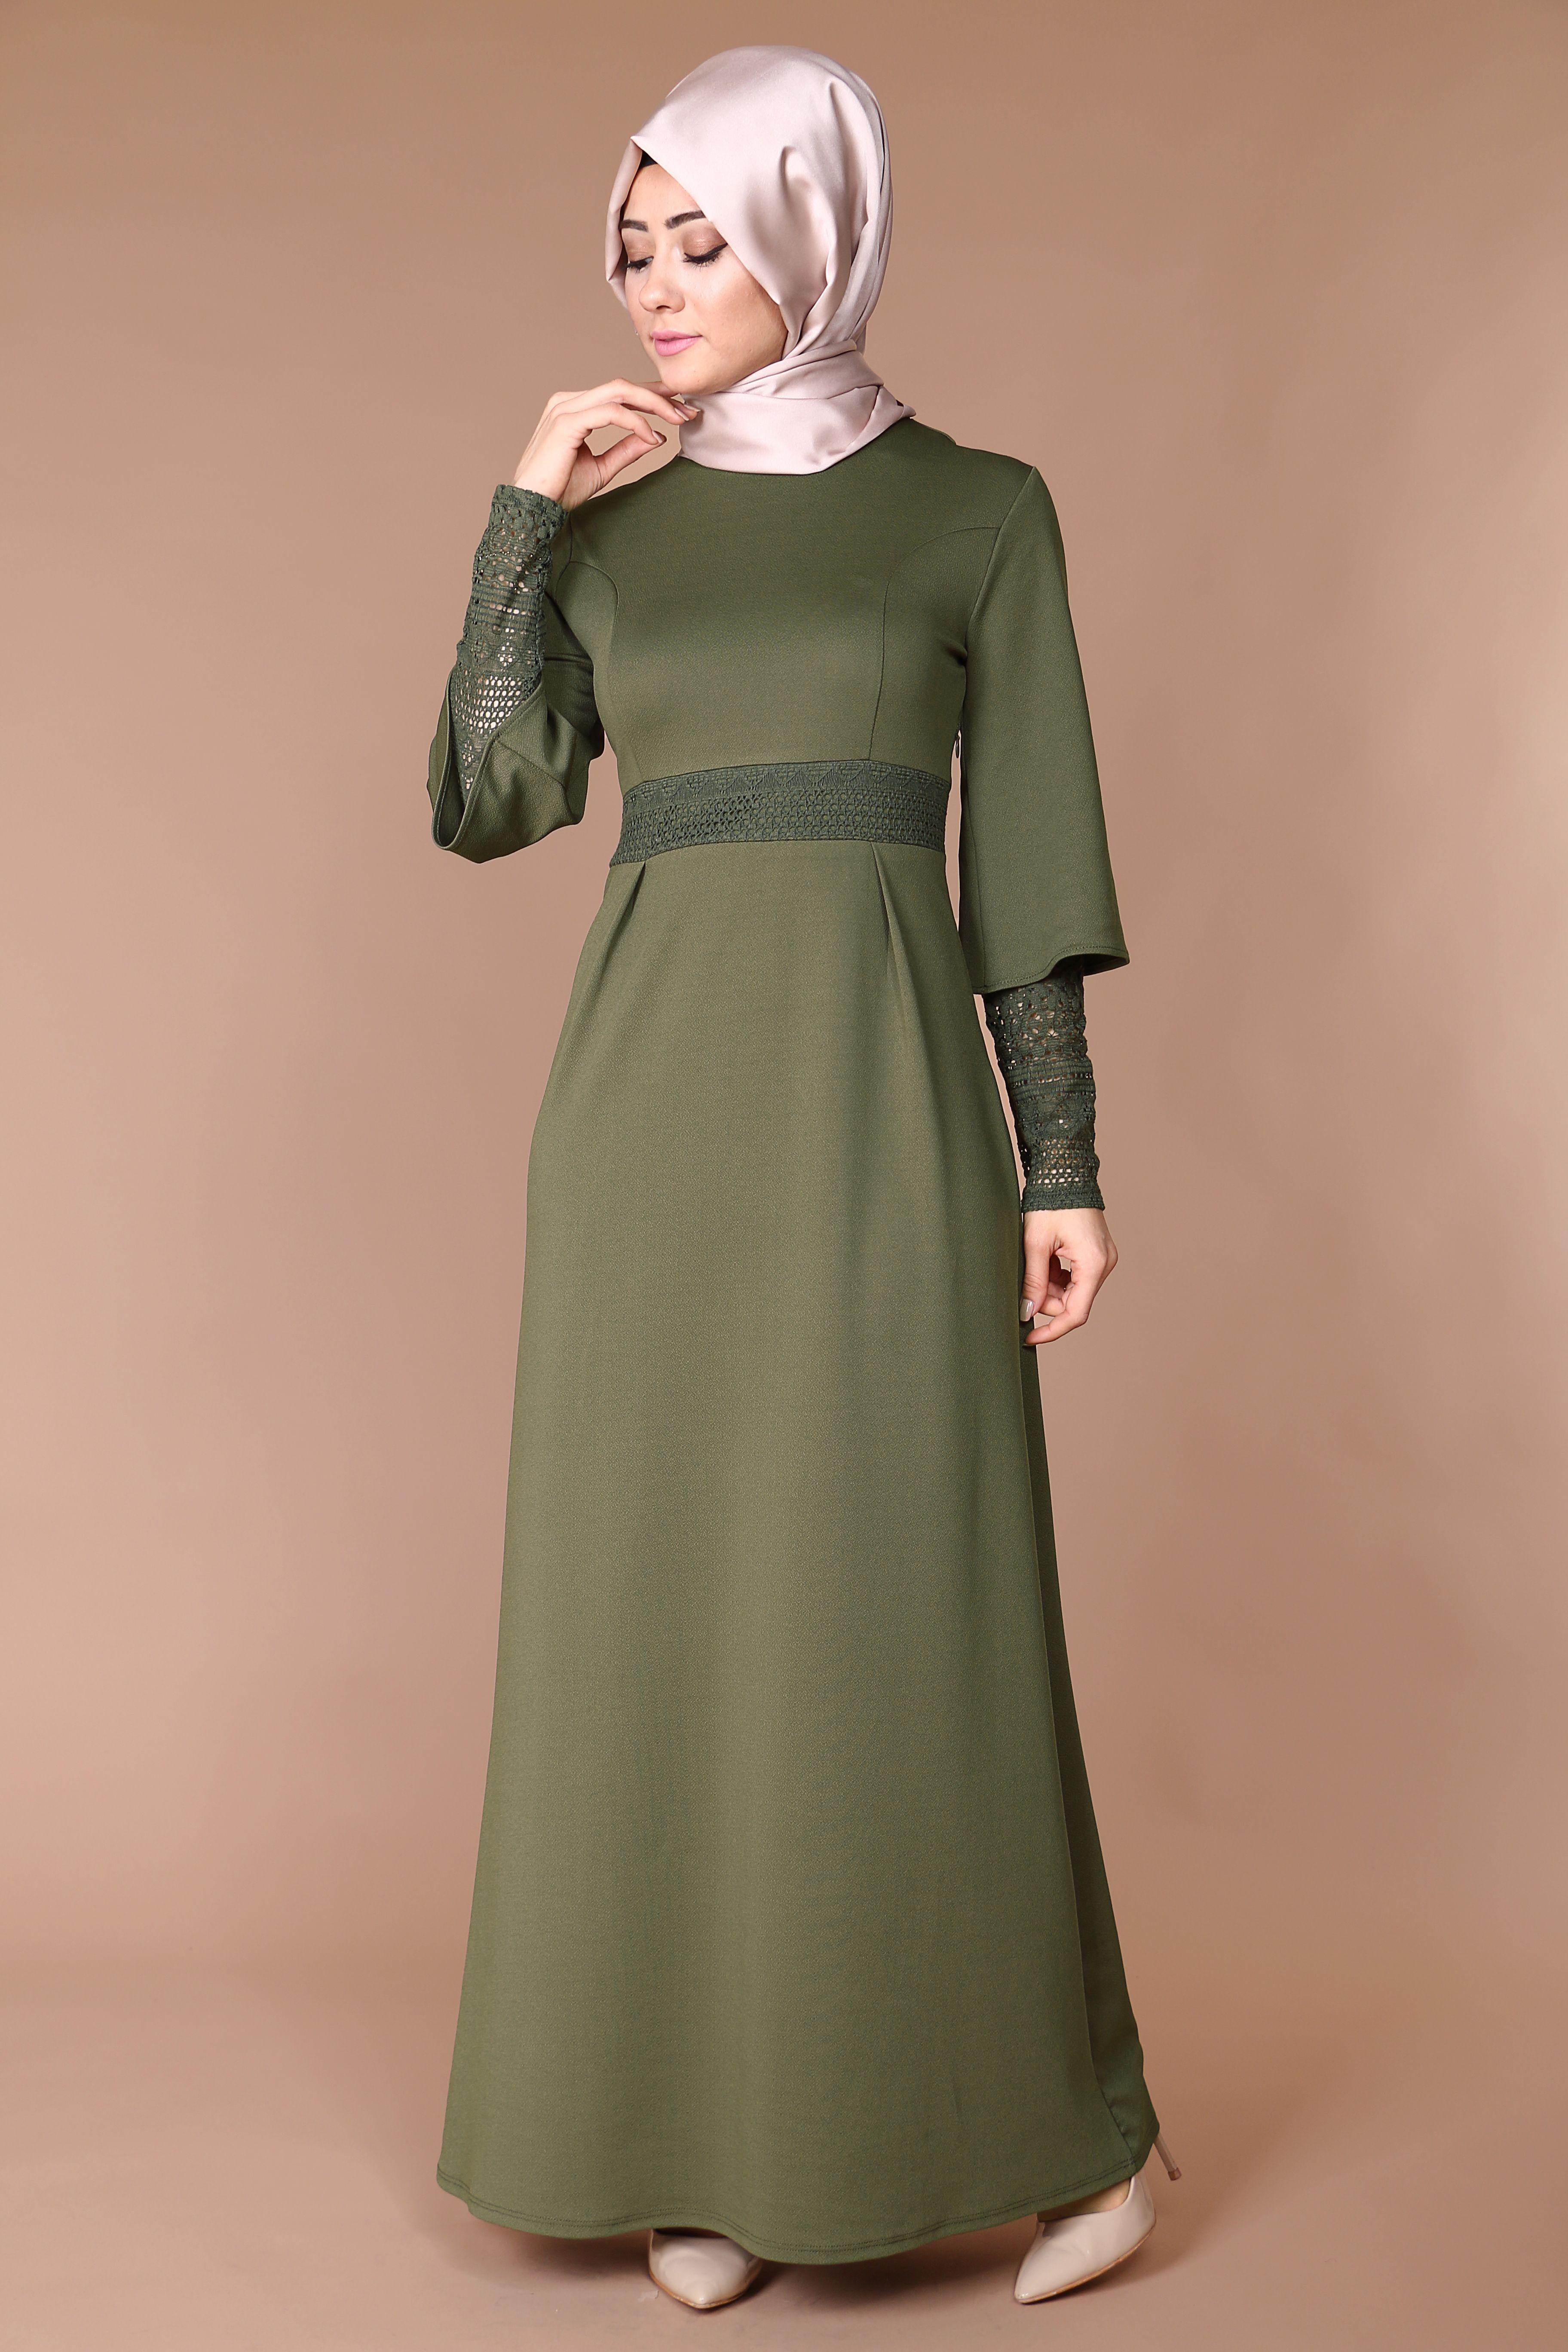 6cfb6af2f3334 Kol içi detaylı elbise MDB3757 Müslüman Elbisesi, Türban Kıyafetler, Hijab  Chic, Islami Moda